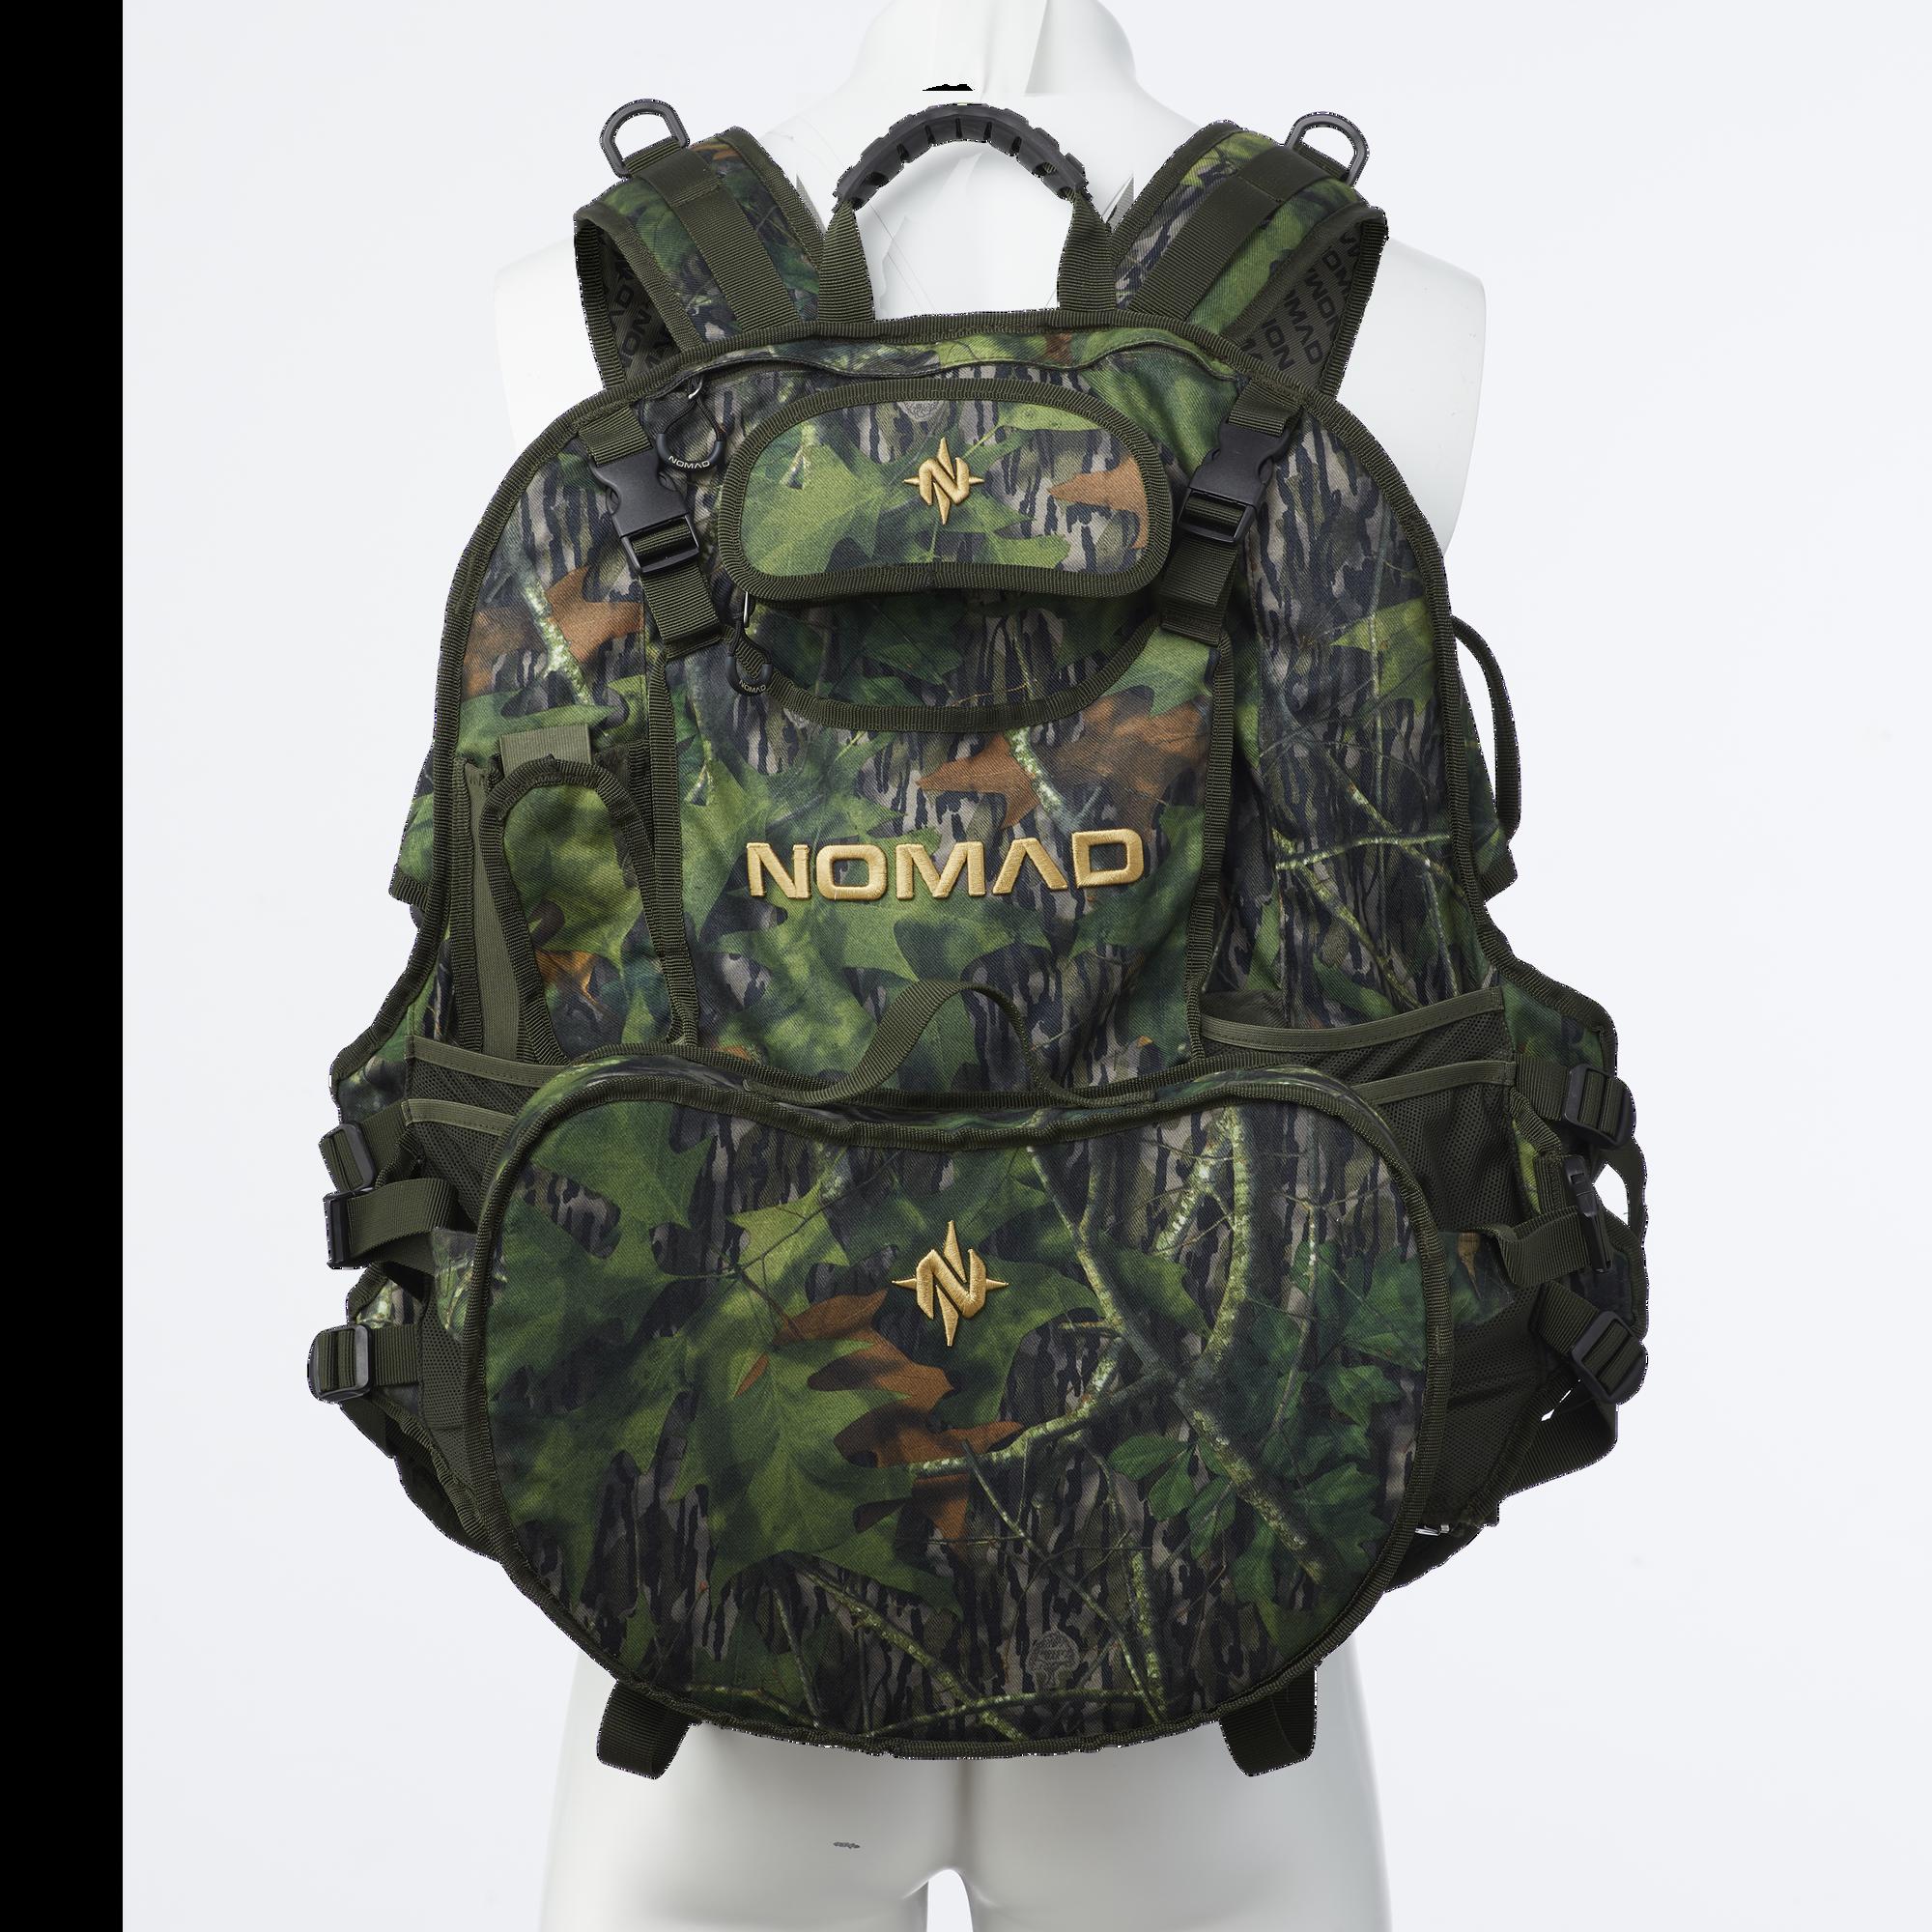 Nomad Nomad Killin' Time Turkey Vest in MO Bottomland